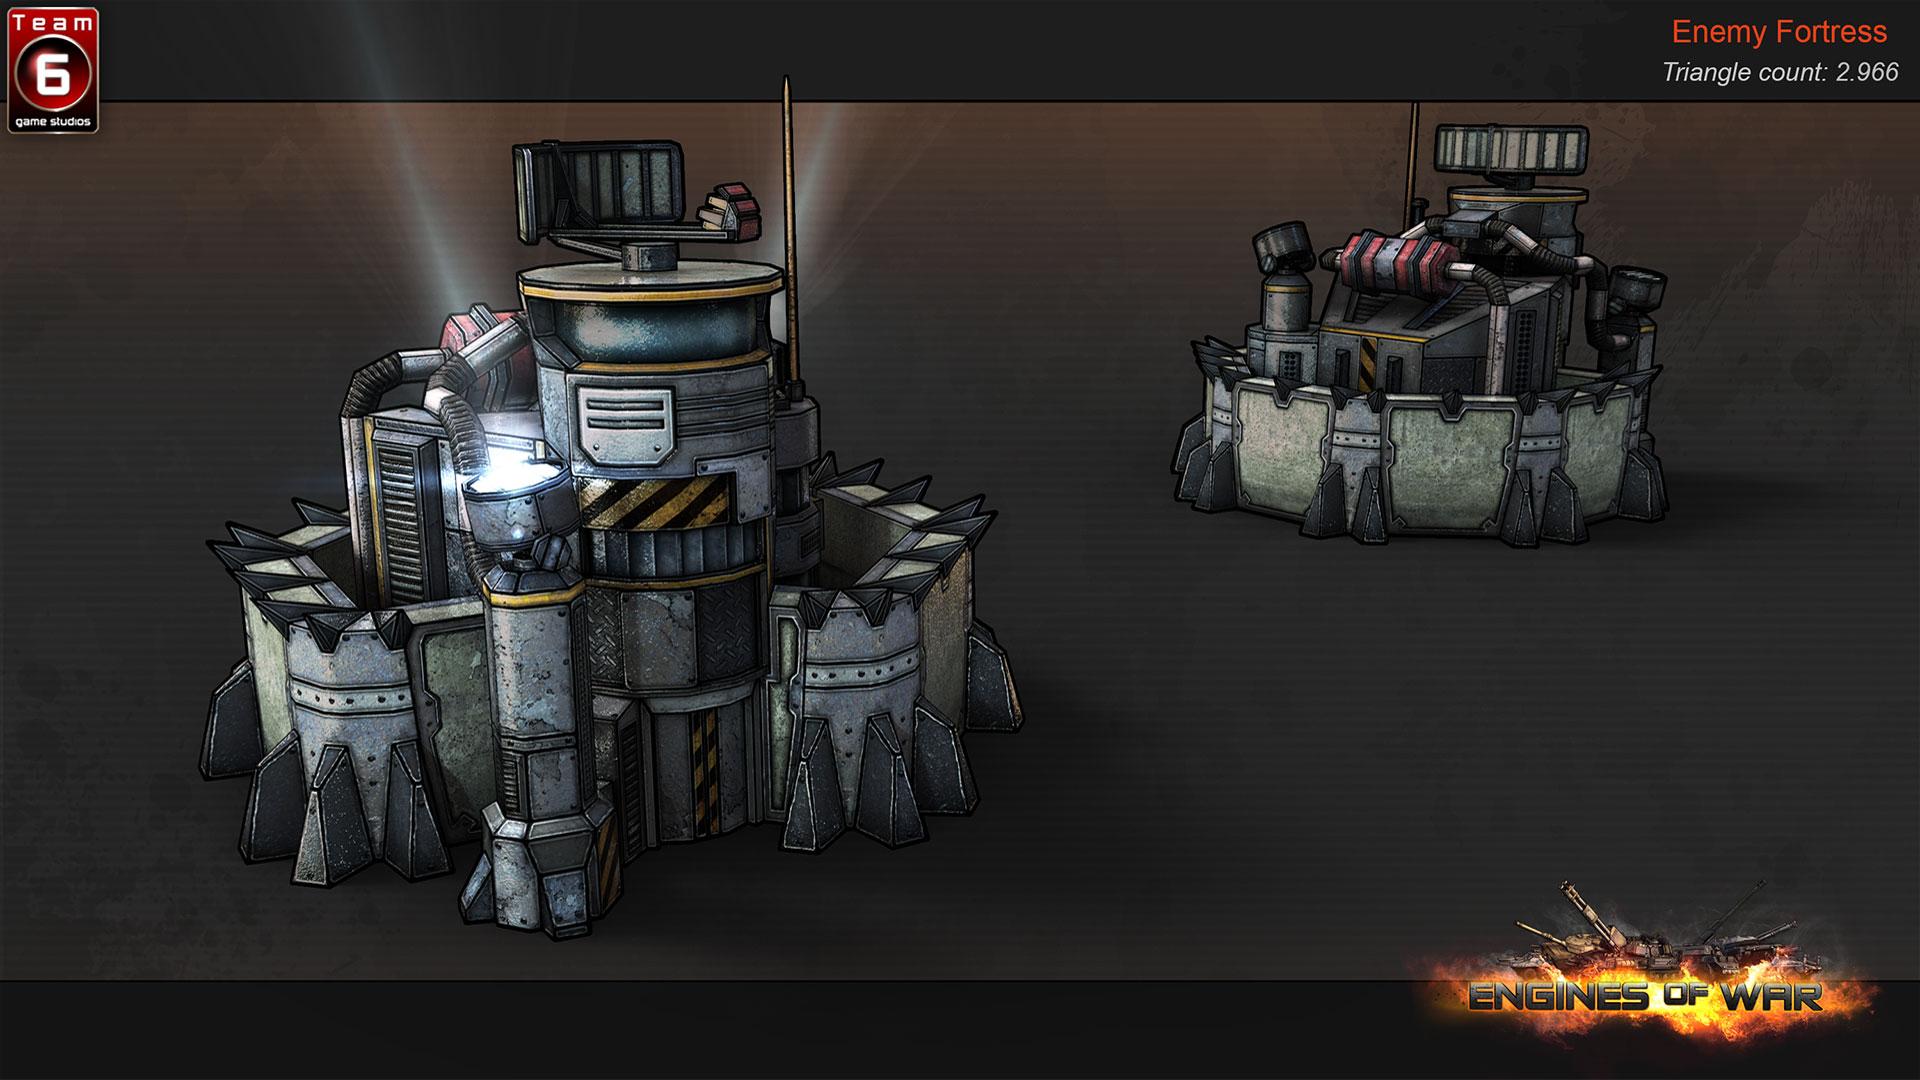 Enemy_Fortress_EnginesOfWar